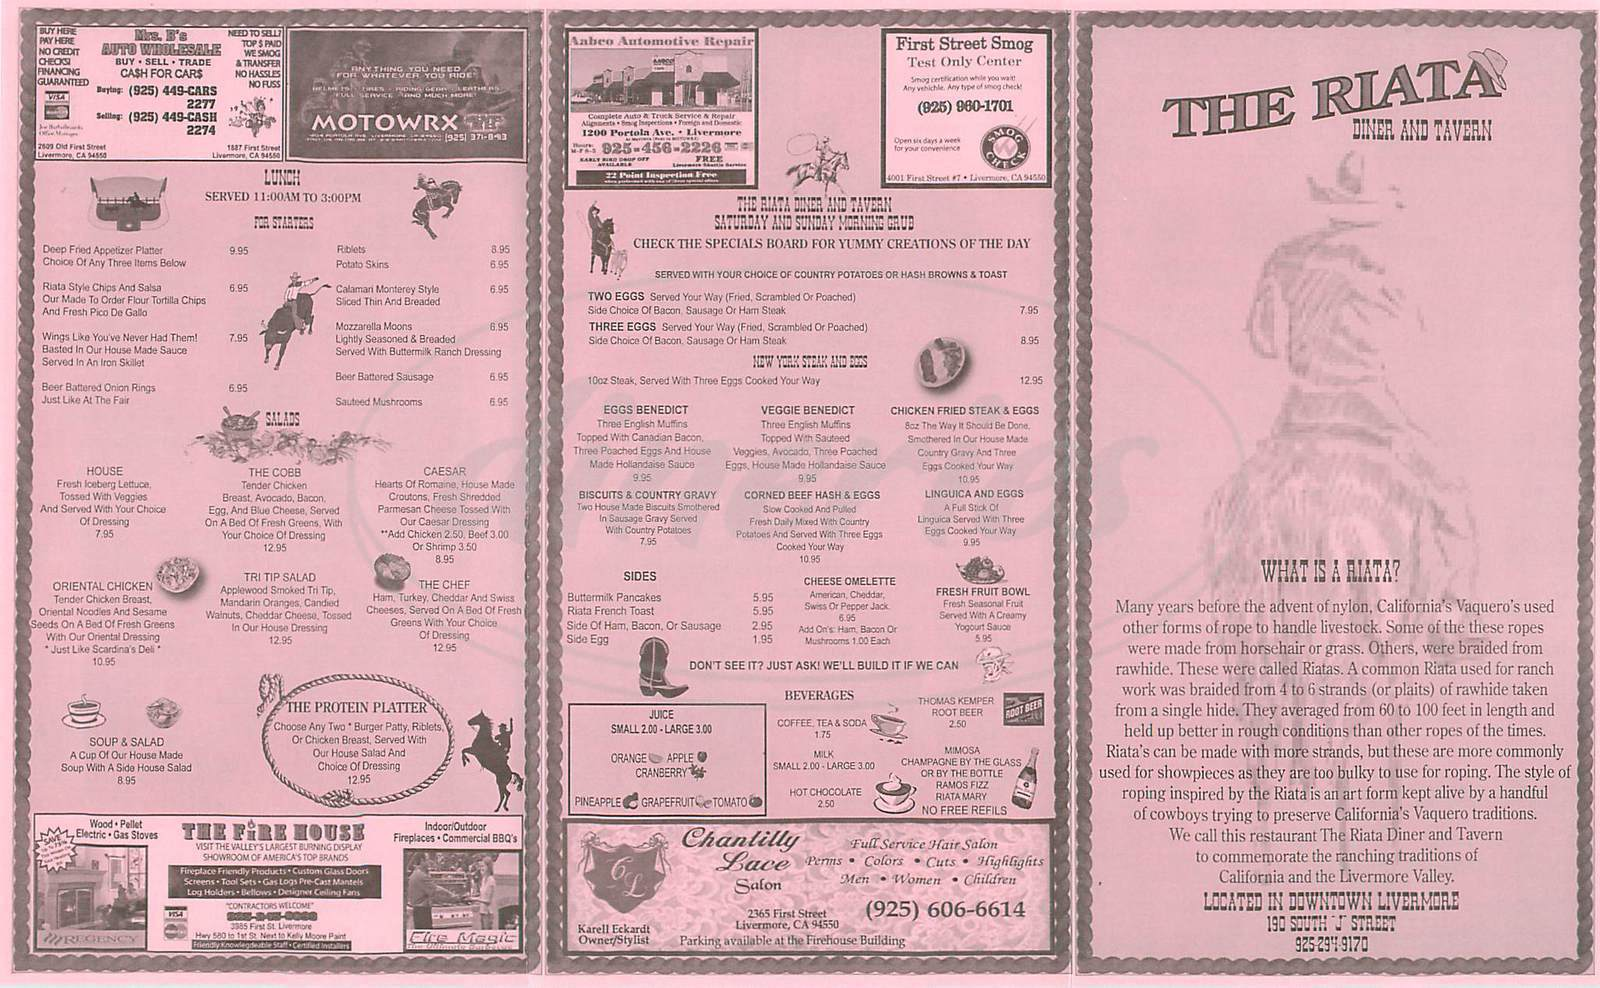 menu for The Riata Diner & Tavern